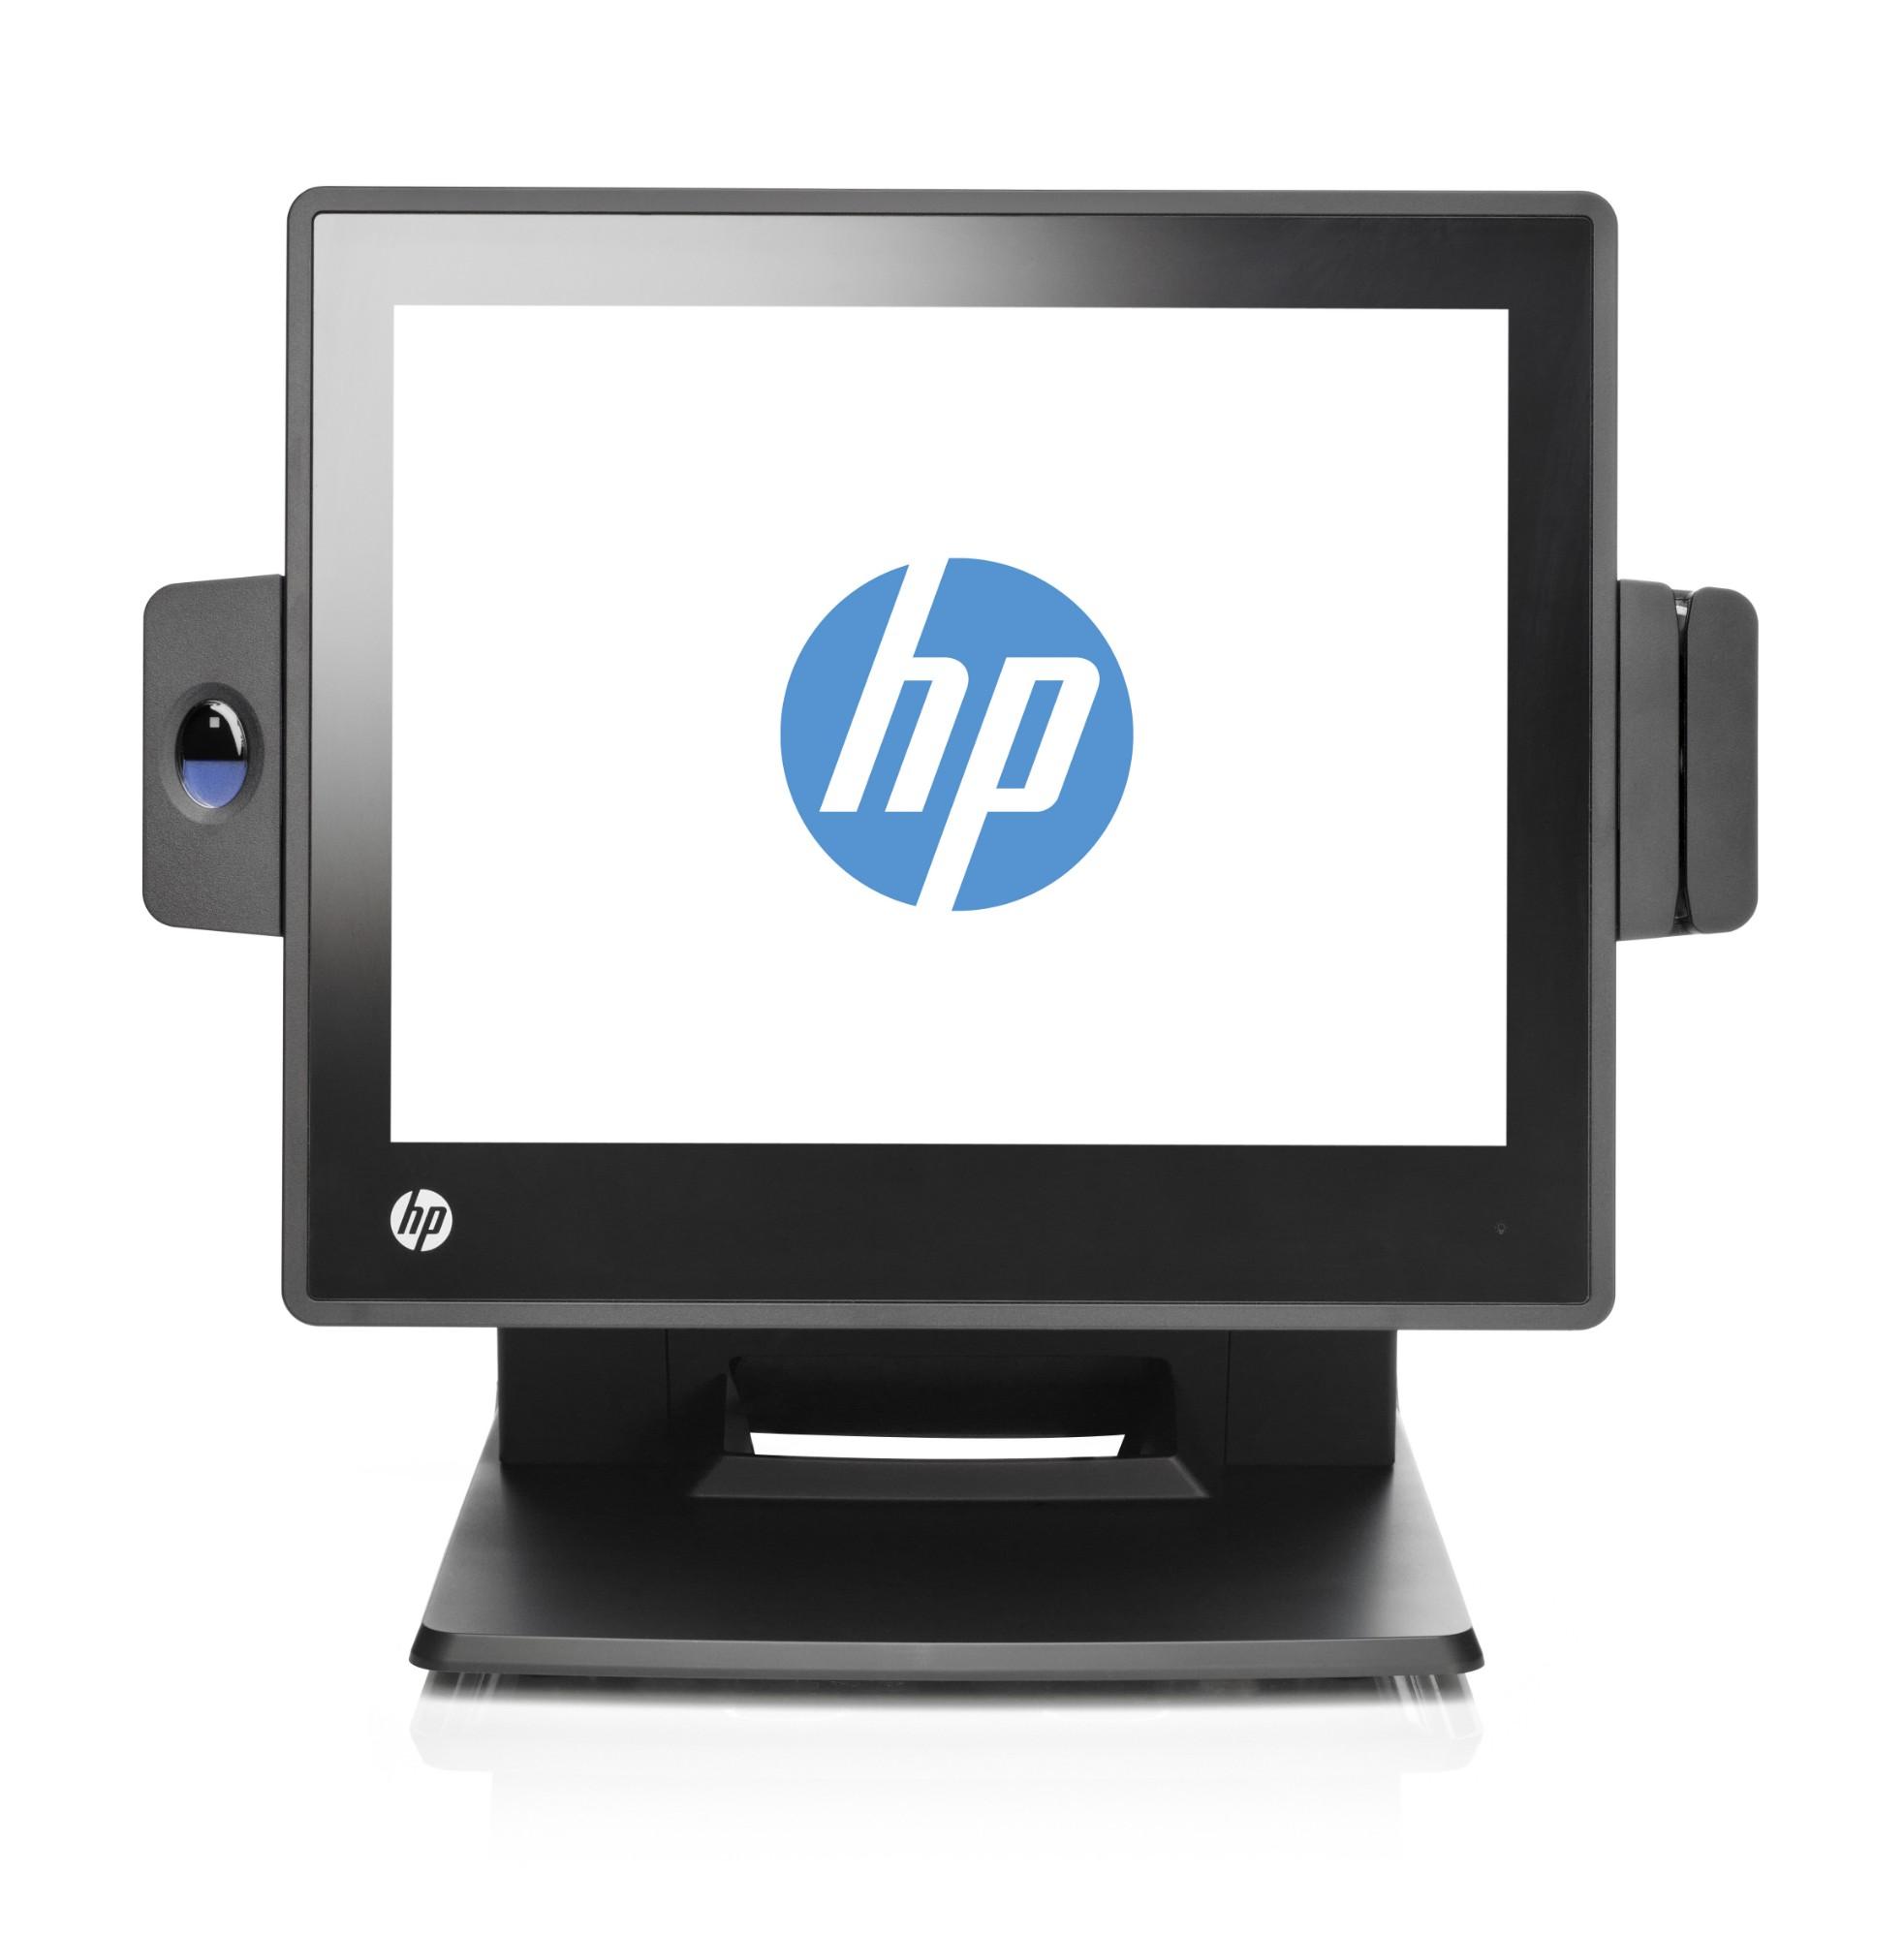 HP rp RP7 7800 2.5GHz i5-2400S Black POS terminal